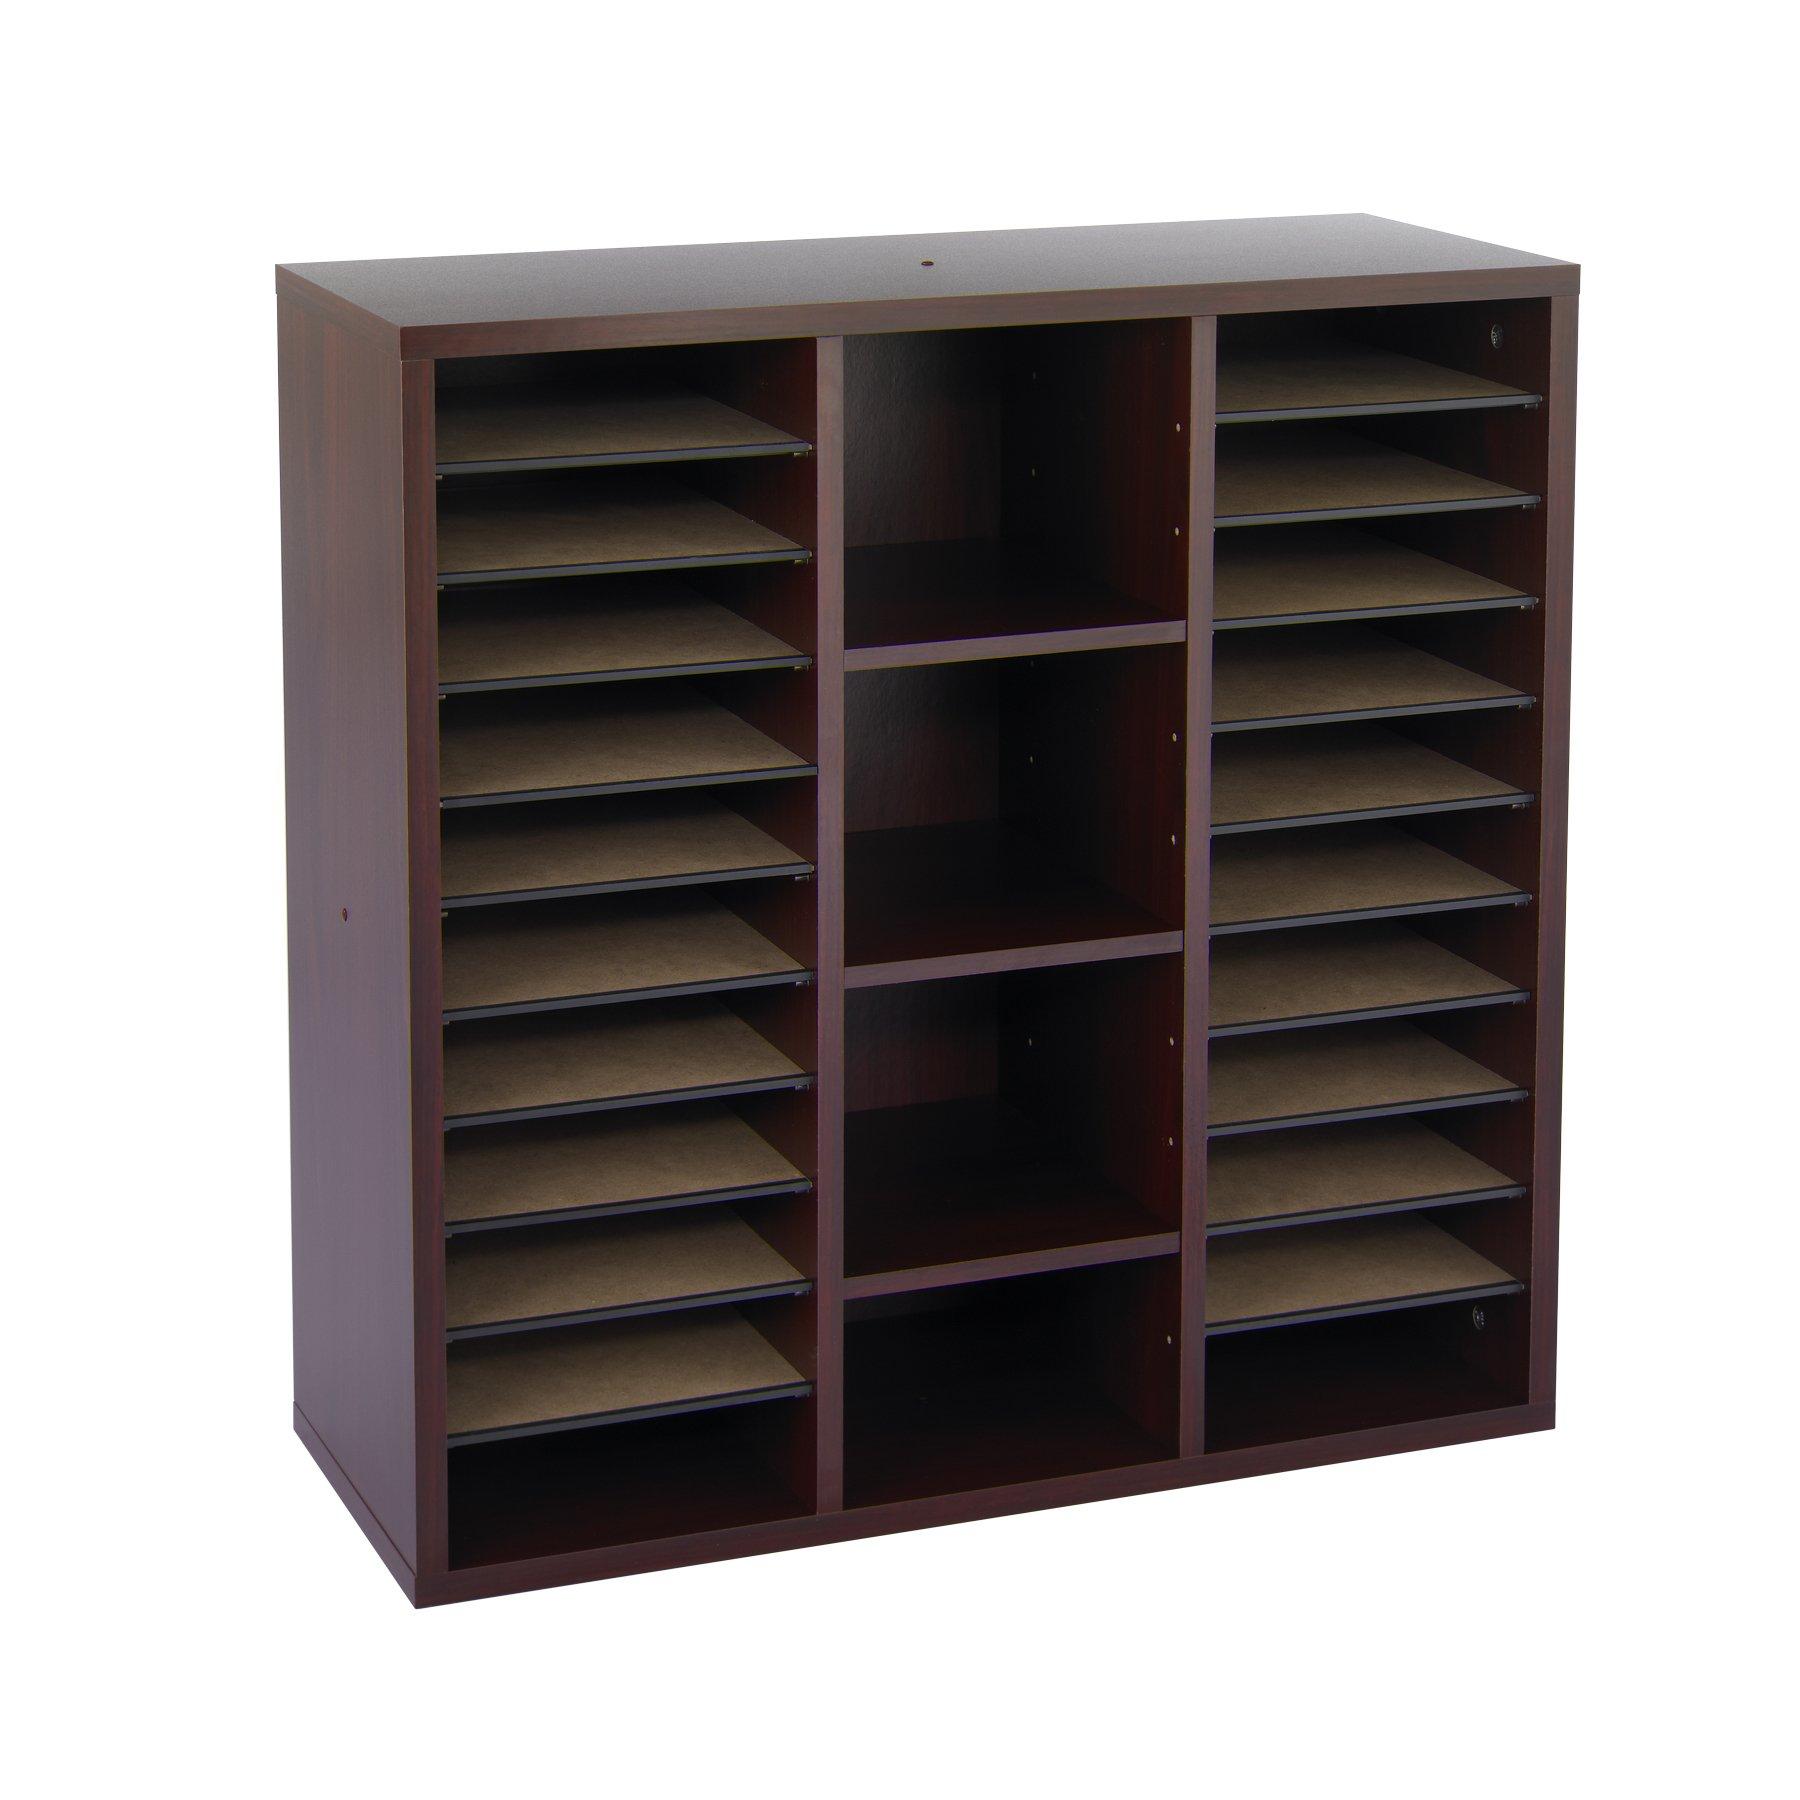 Safco Products 9441MH Apres Modular Storage Literature Organizer, Mahogany